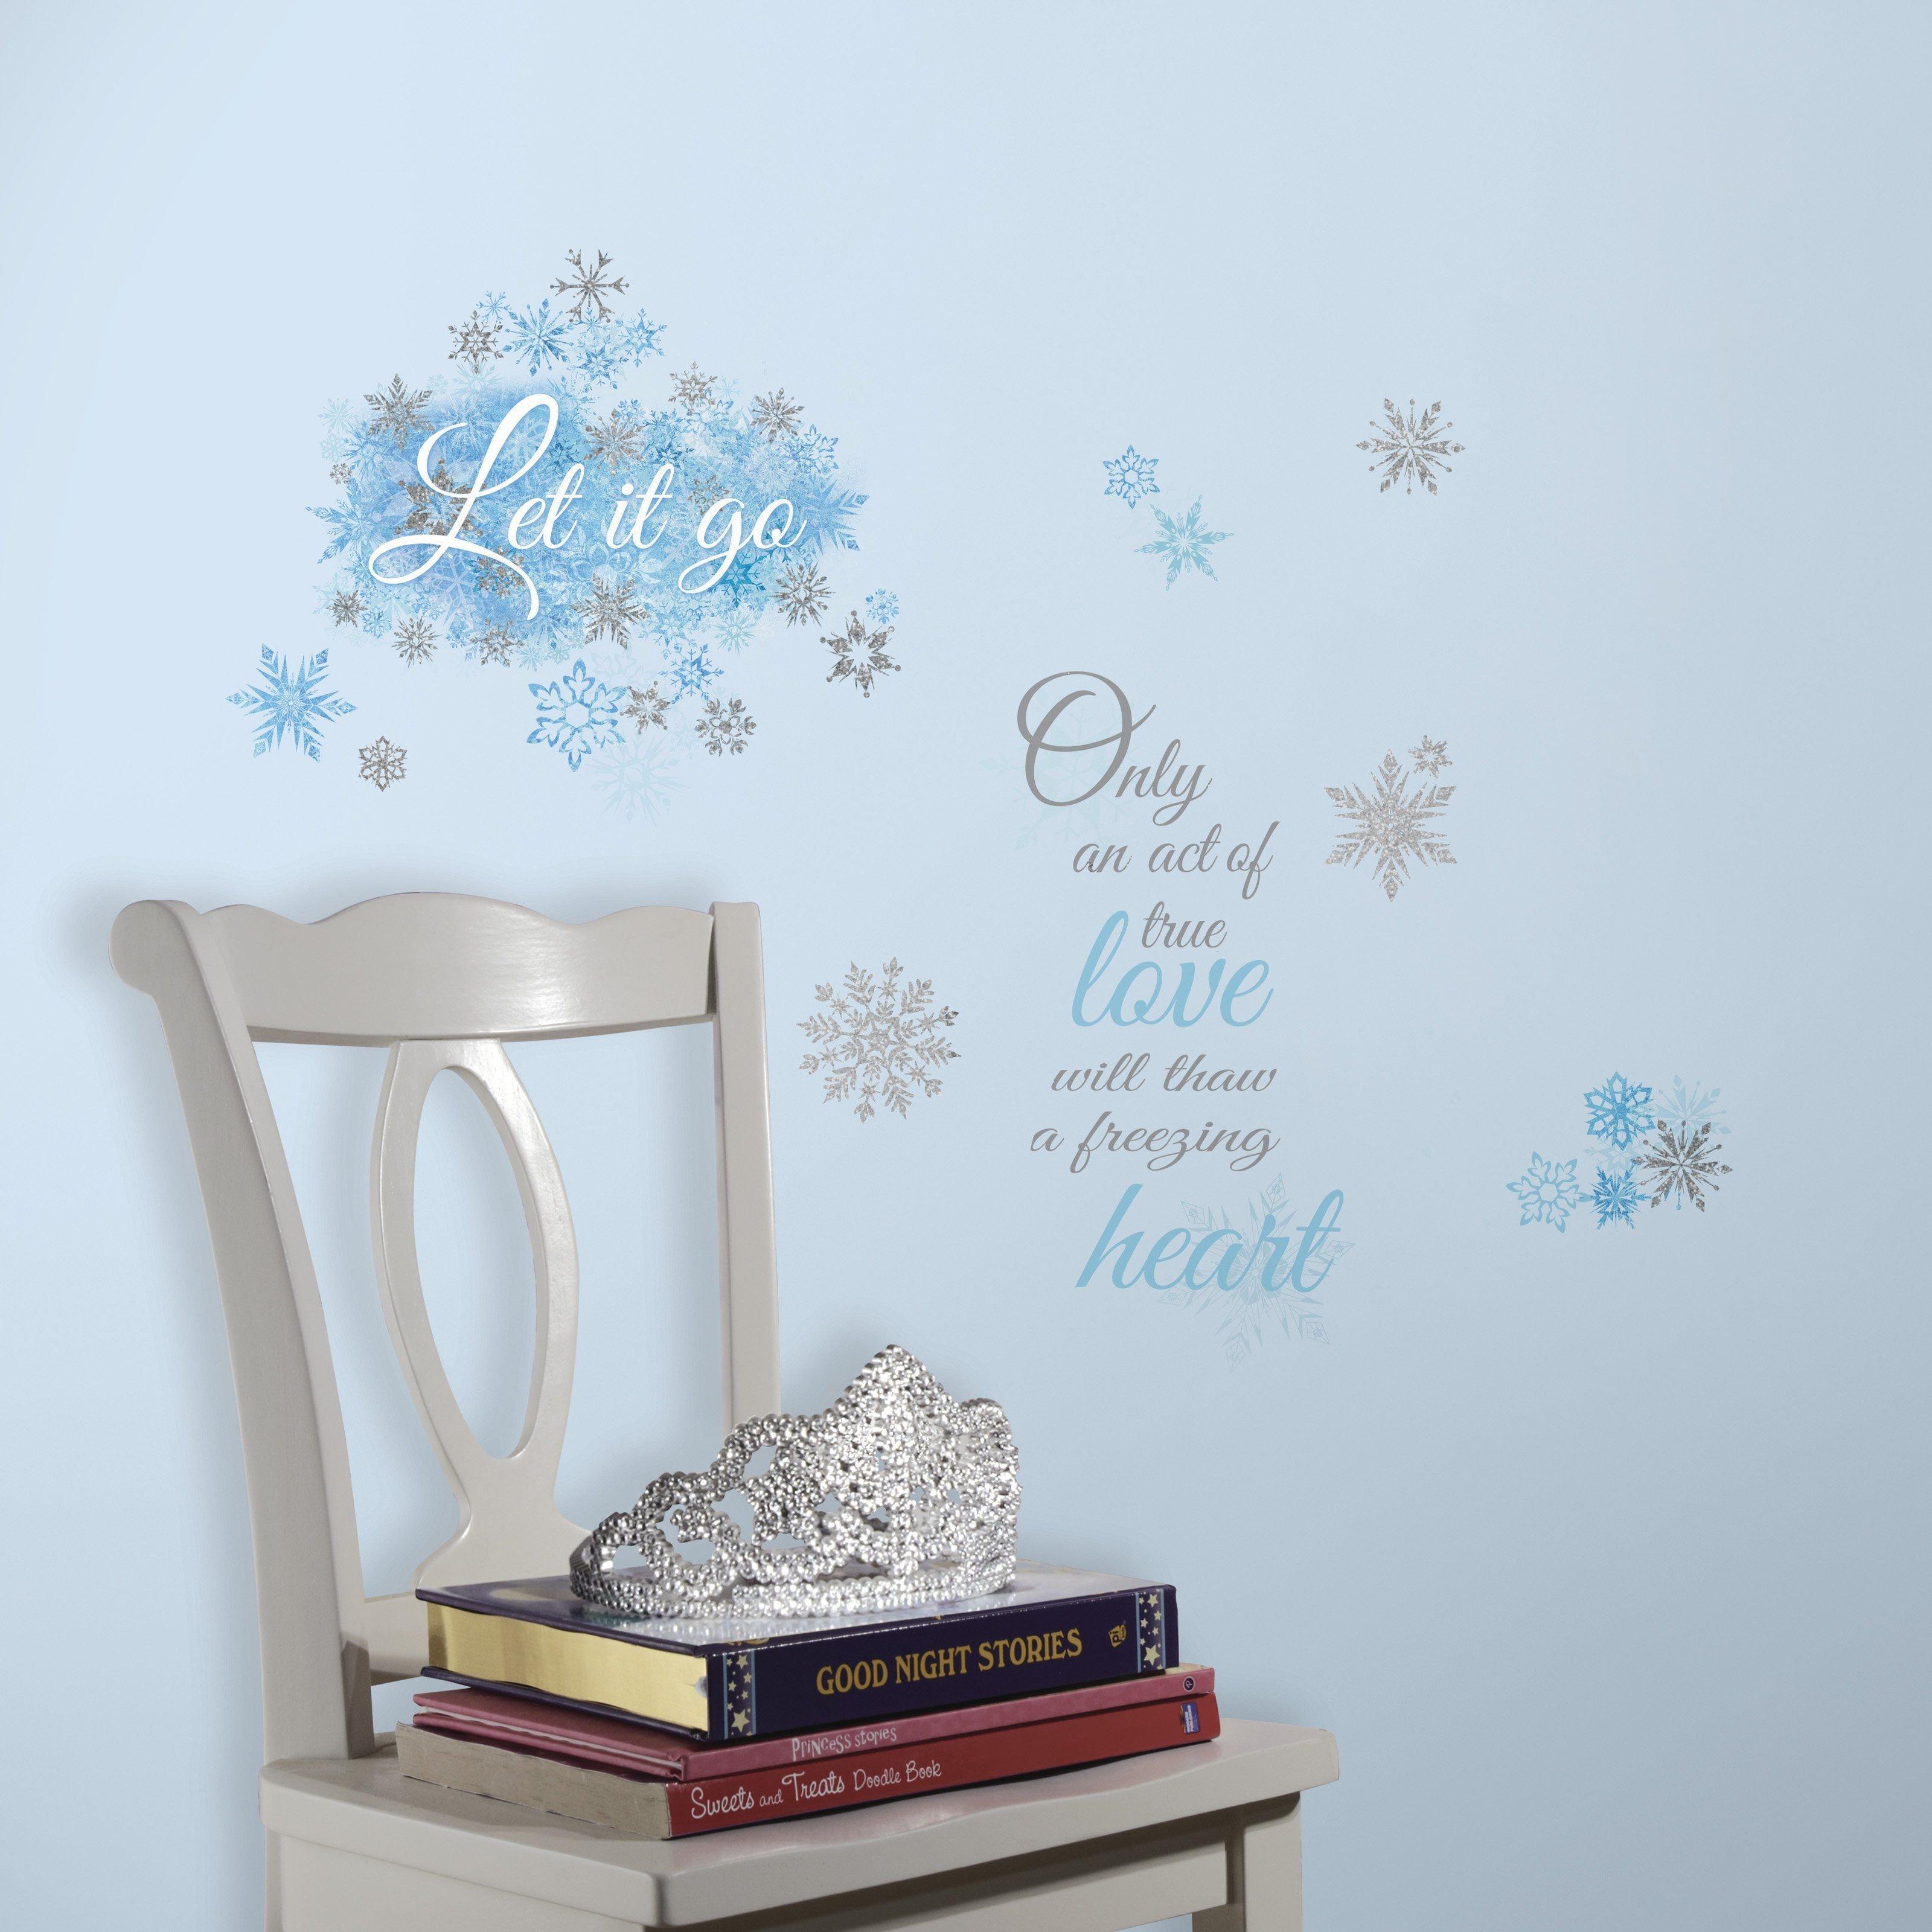 Frozen themed Bedroom Ideas Beautiful Disney Frozen Let It Go Peel and Stick Wall Decals